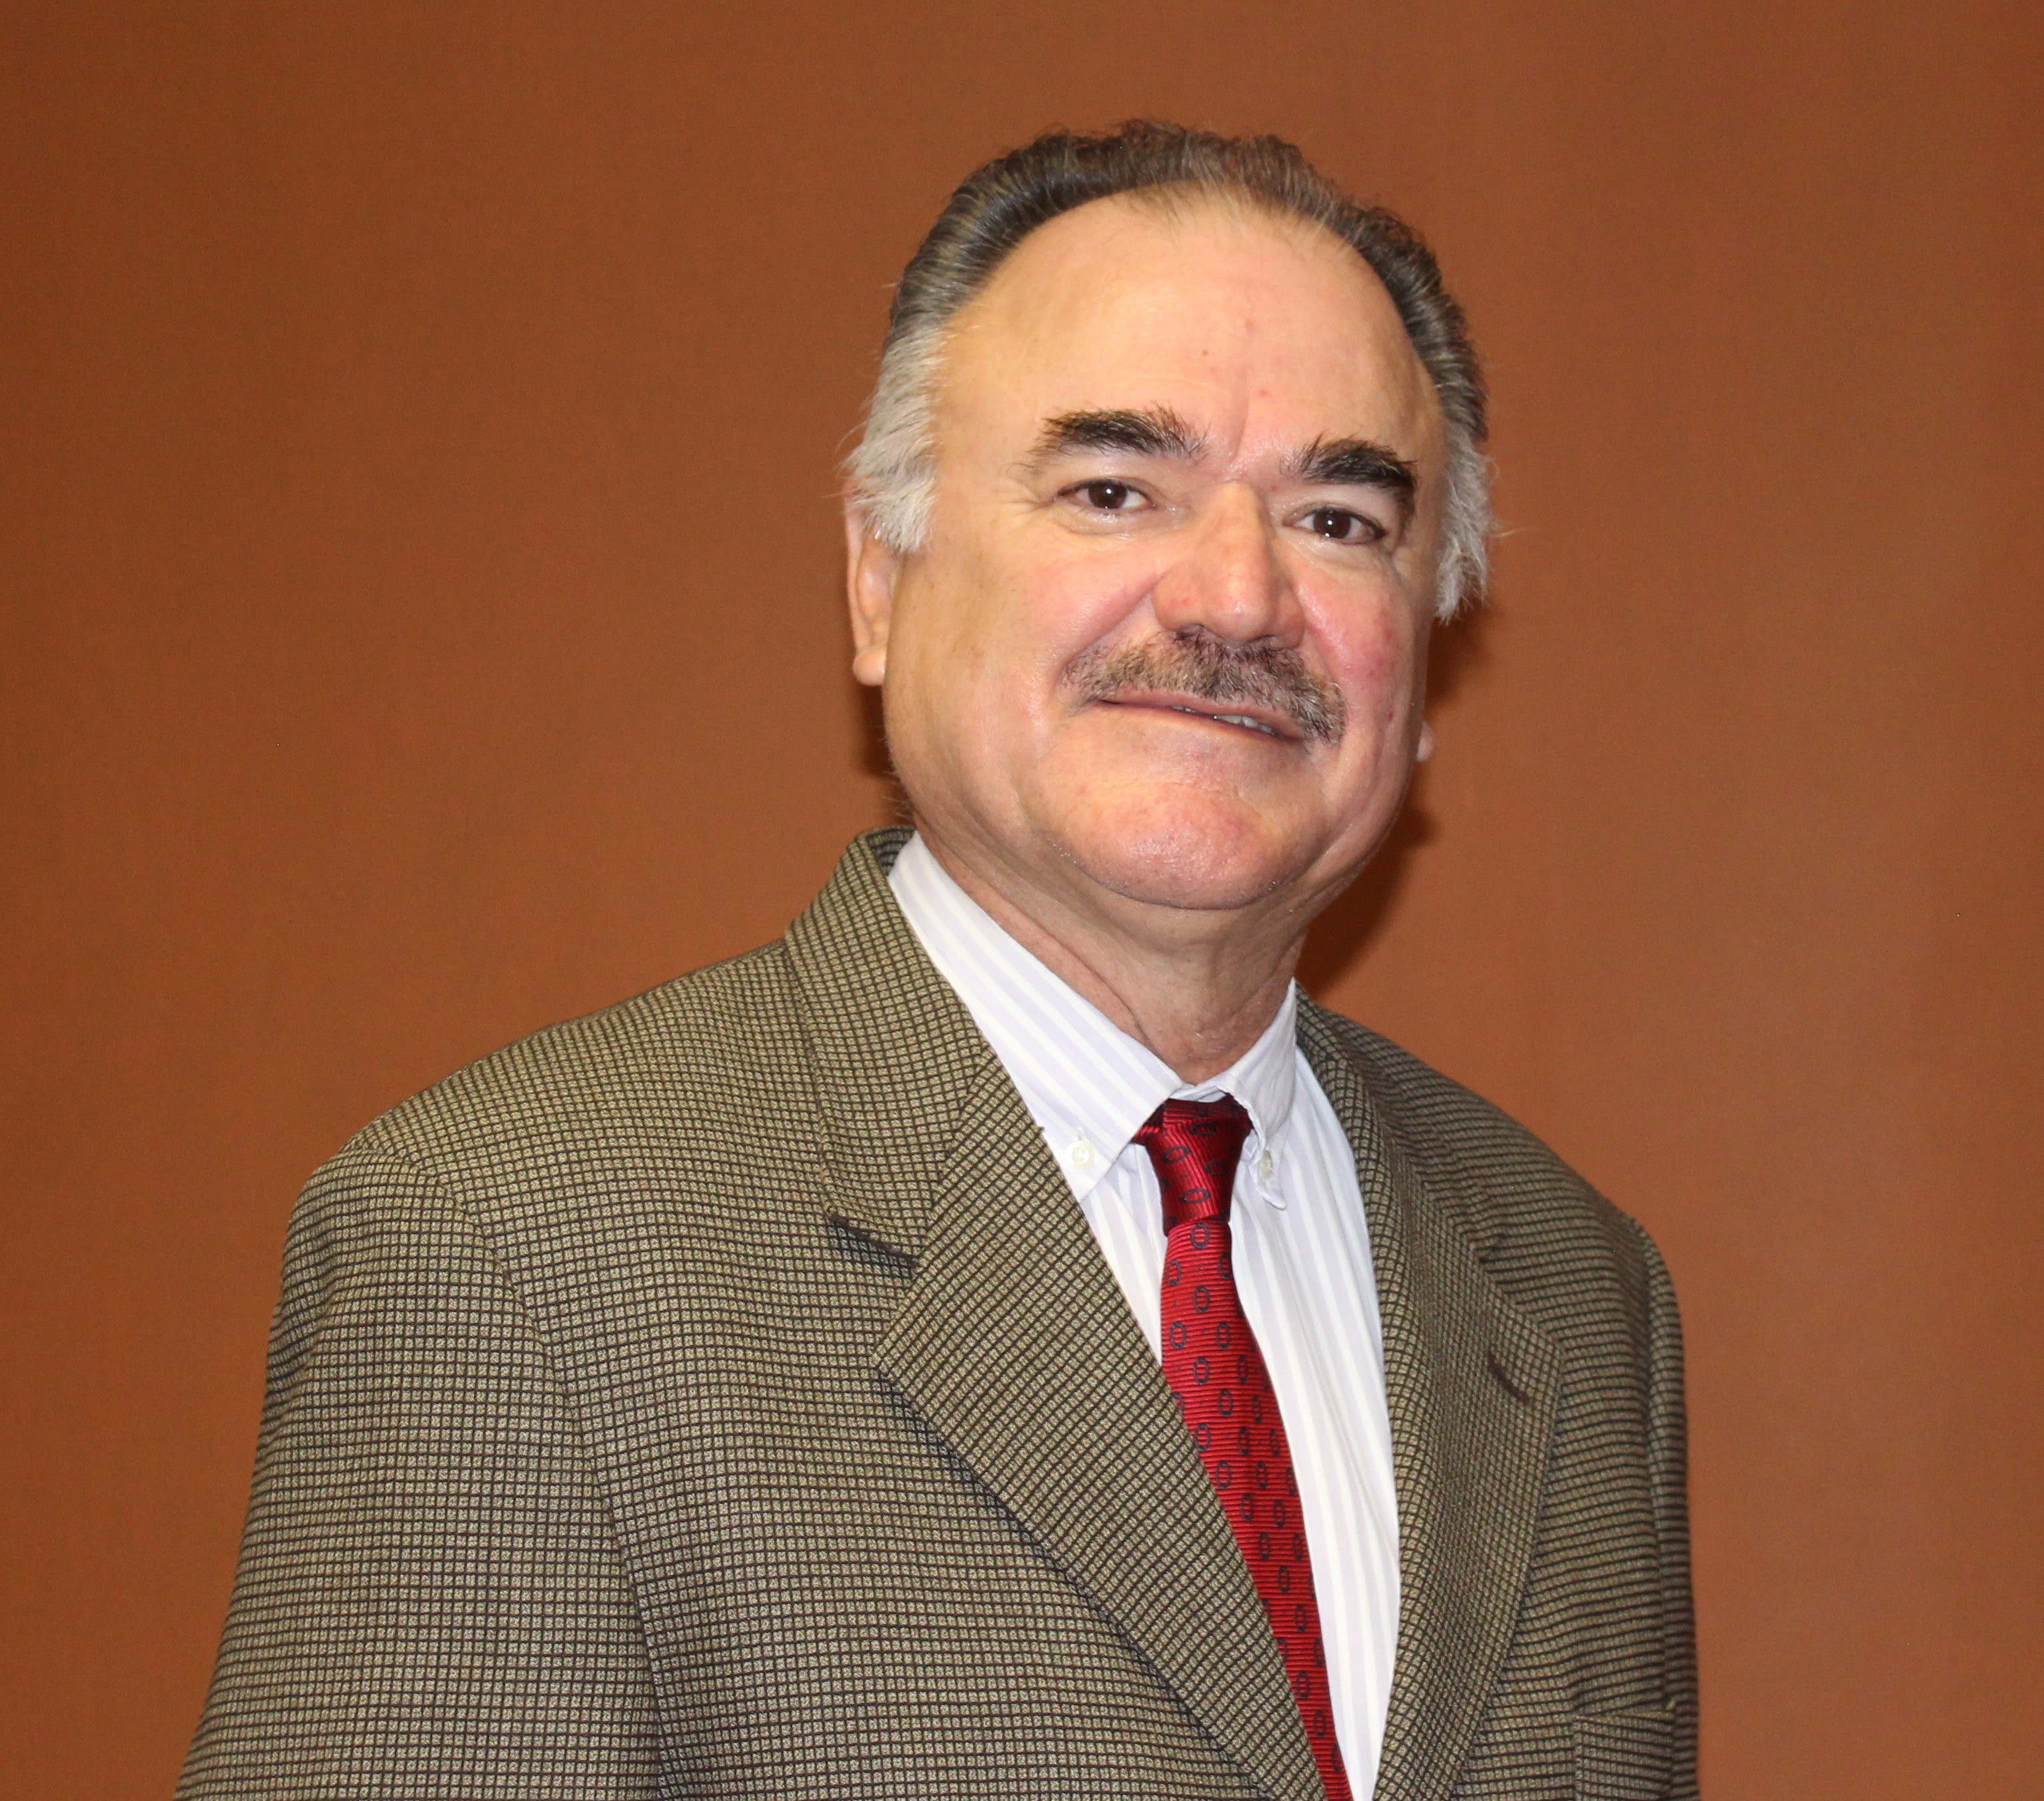 Luis Ángel Rodríguez del Bosque